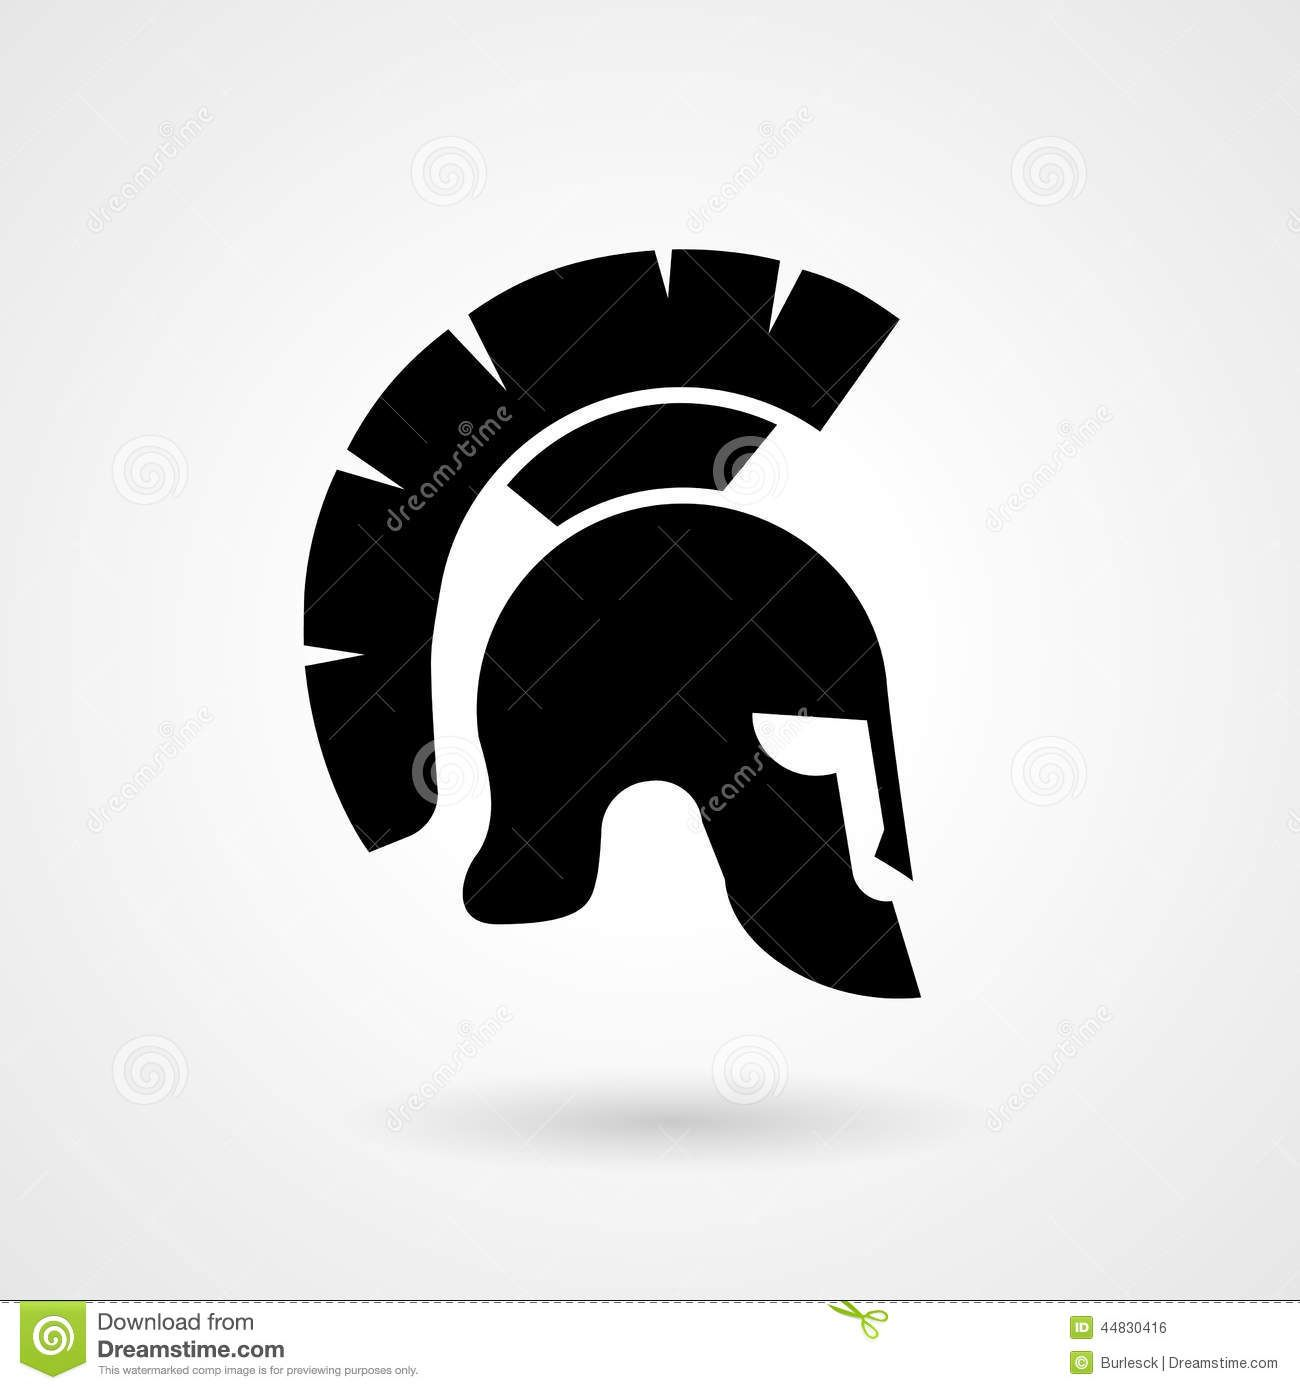 Silhouette of an ancient roman or greek helmet stock vector silhouette of an ancient roman or greek helmet stock vector image 44830416 biocorpaavc